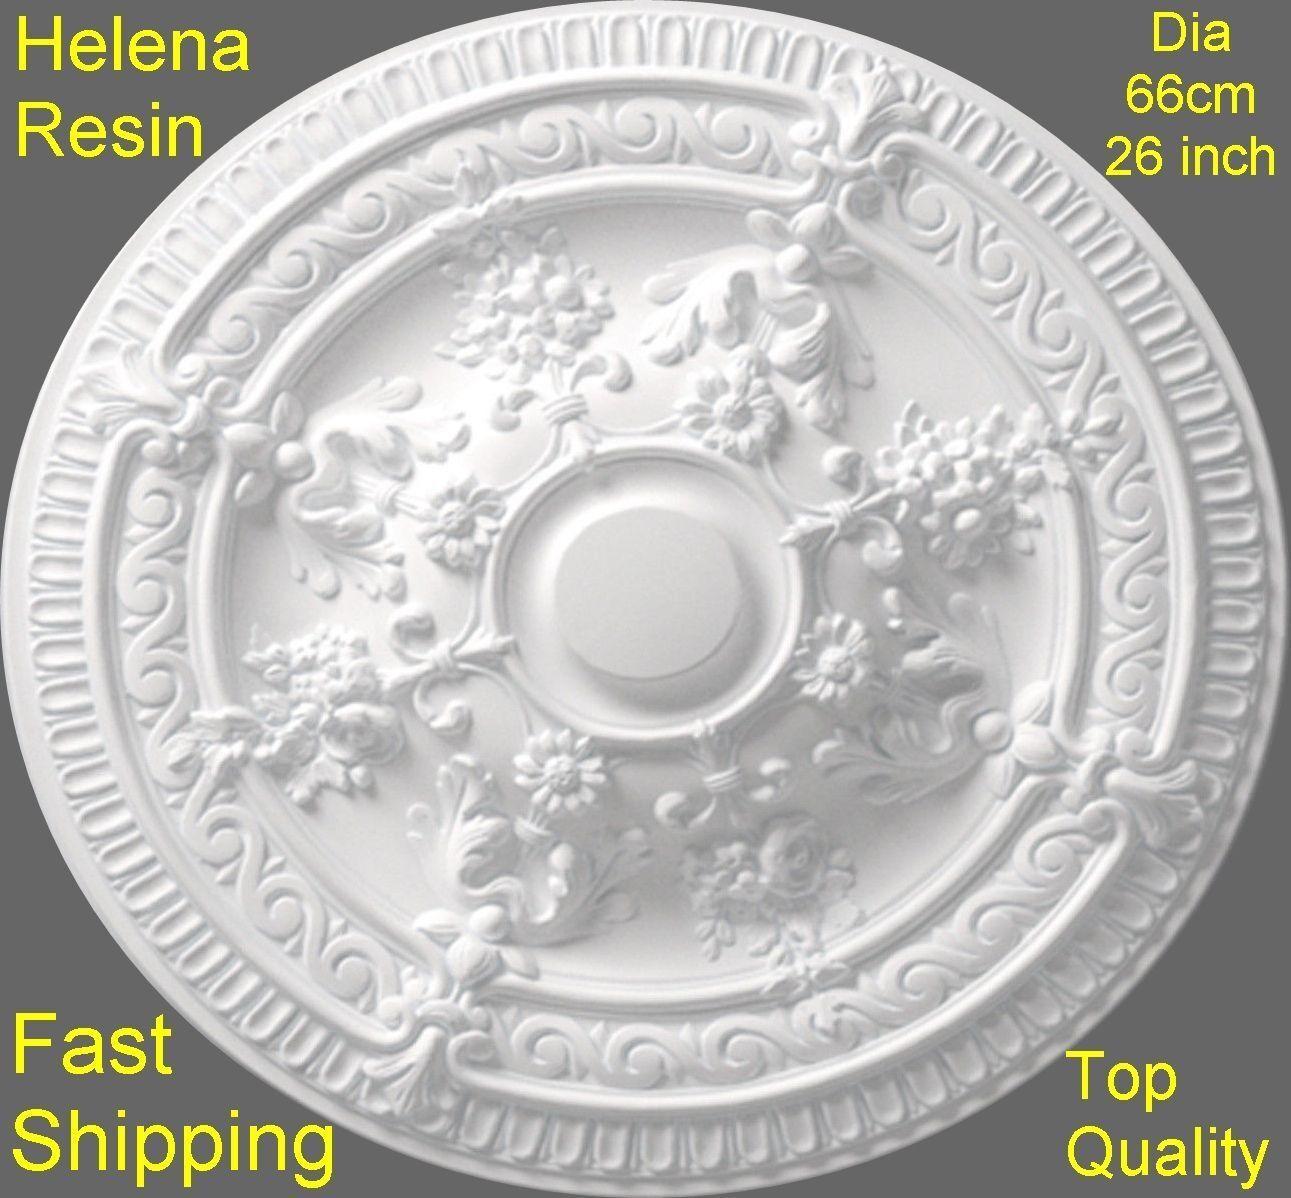 Ceiling rosa Helena resina forte luce design non POLISTIRENE Easy Fix 66 cm DECO